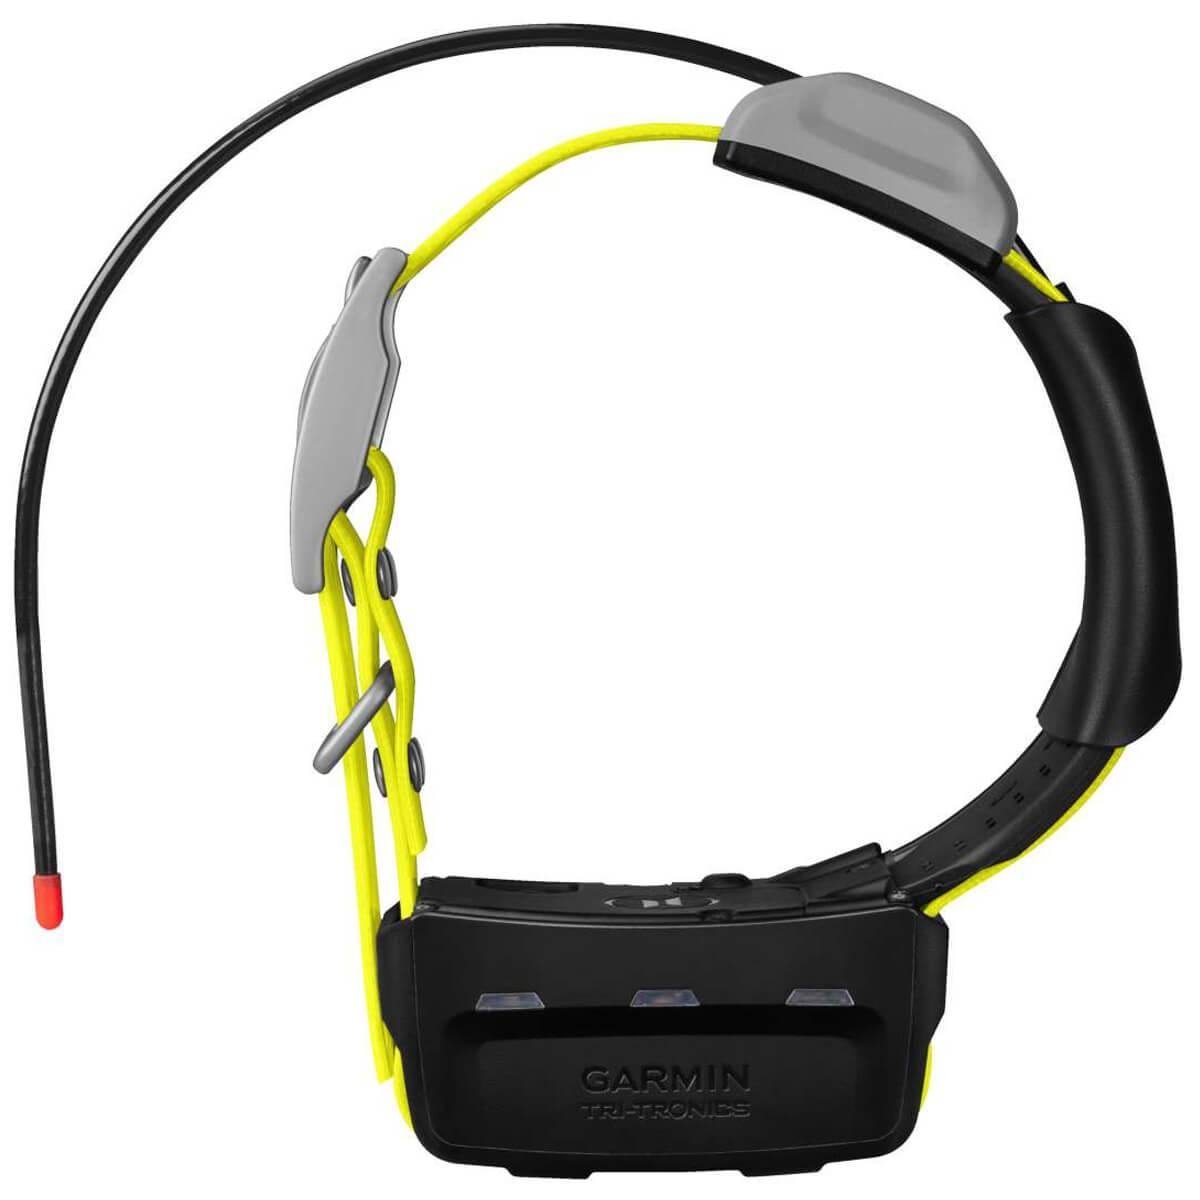 Garmin K5 GPS Hunde-Ortungshalsband